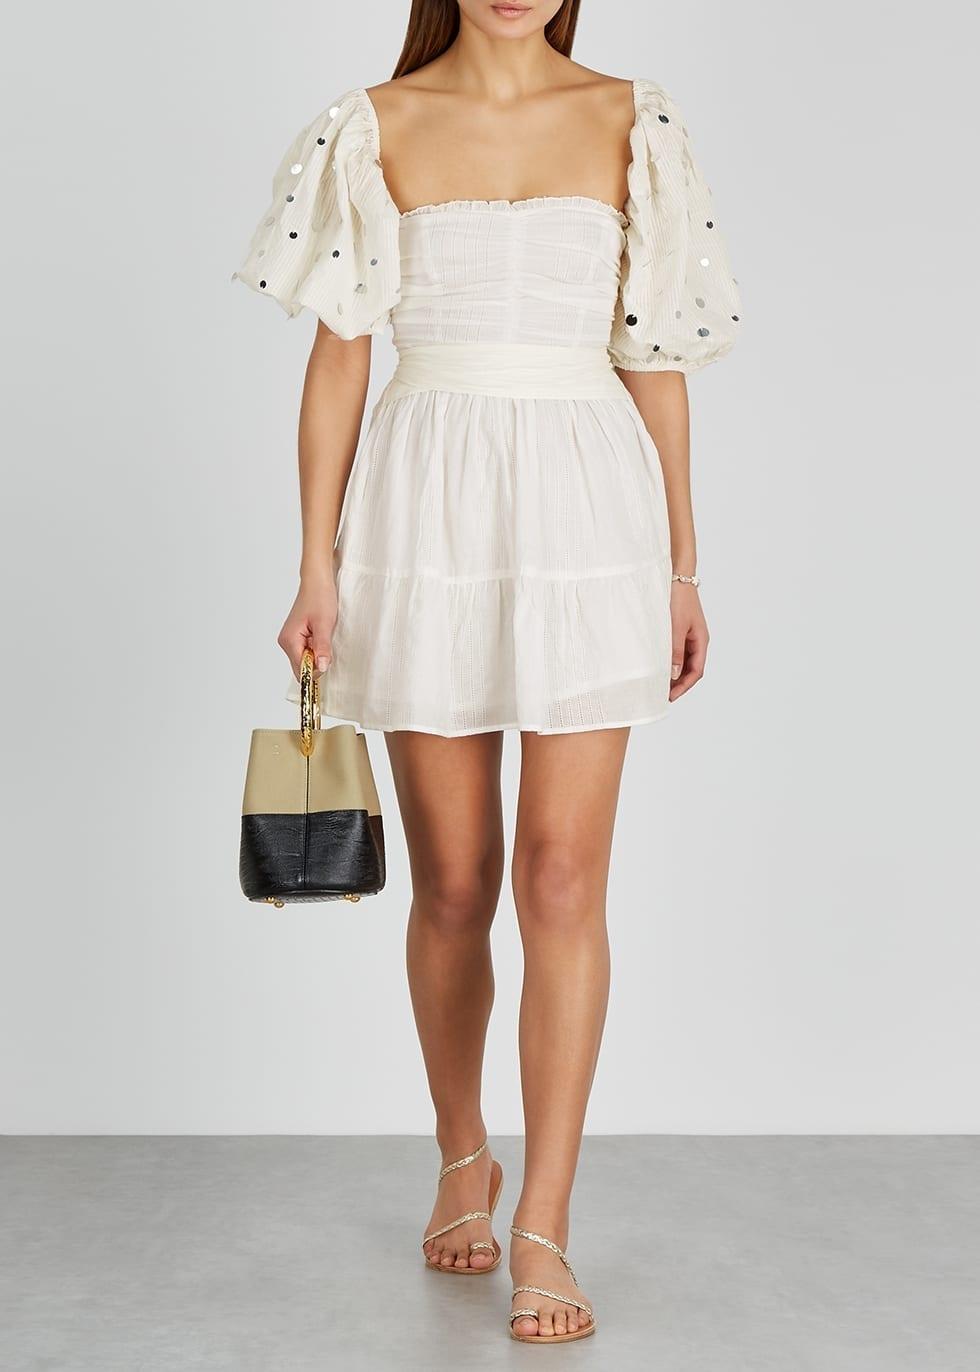 SUNDRESS Alana White Puff-sleeve Cotton Mini Dress